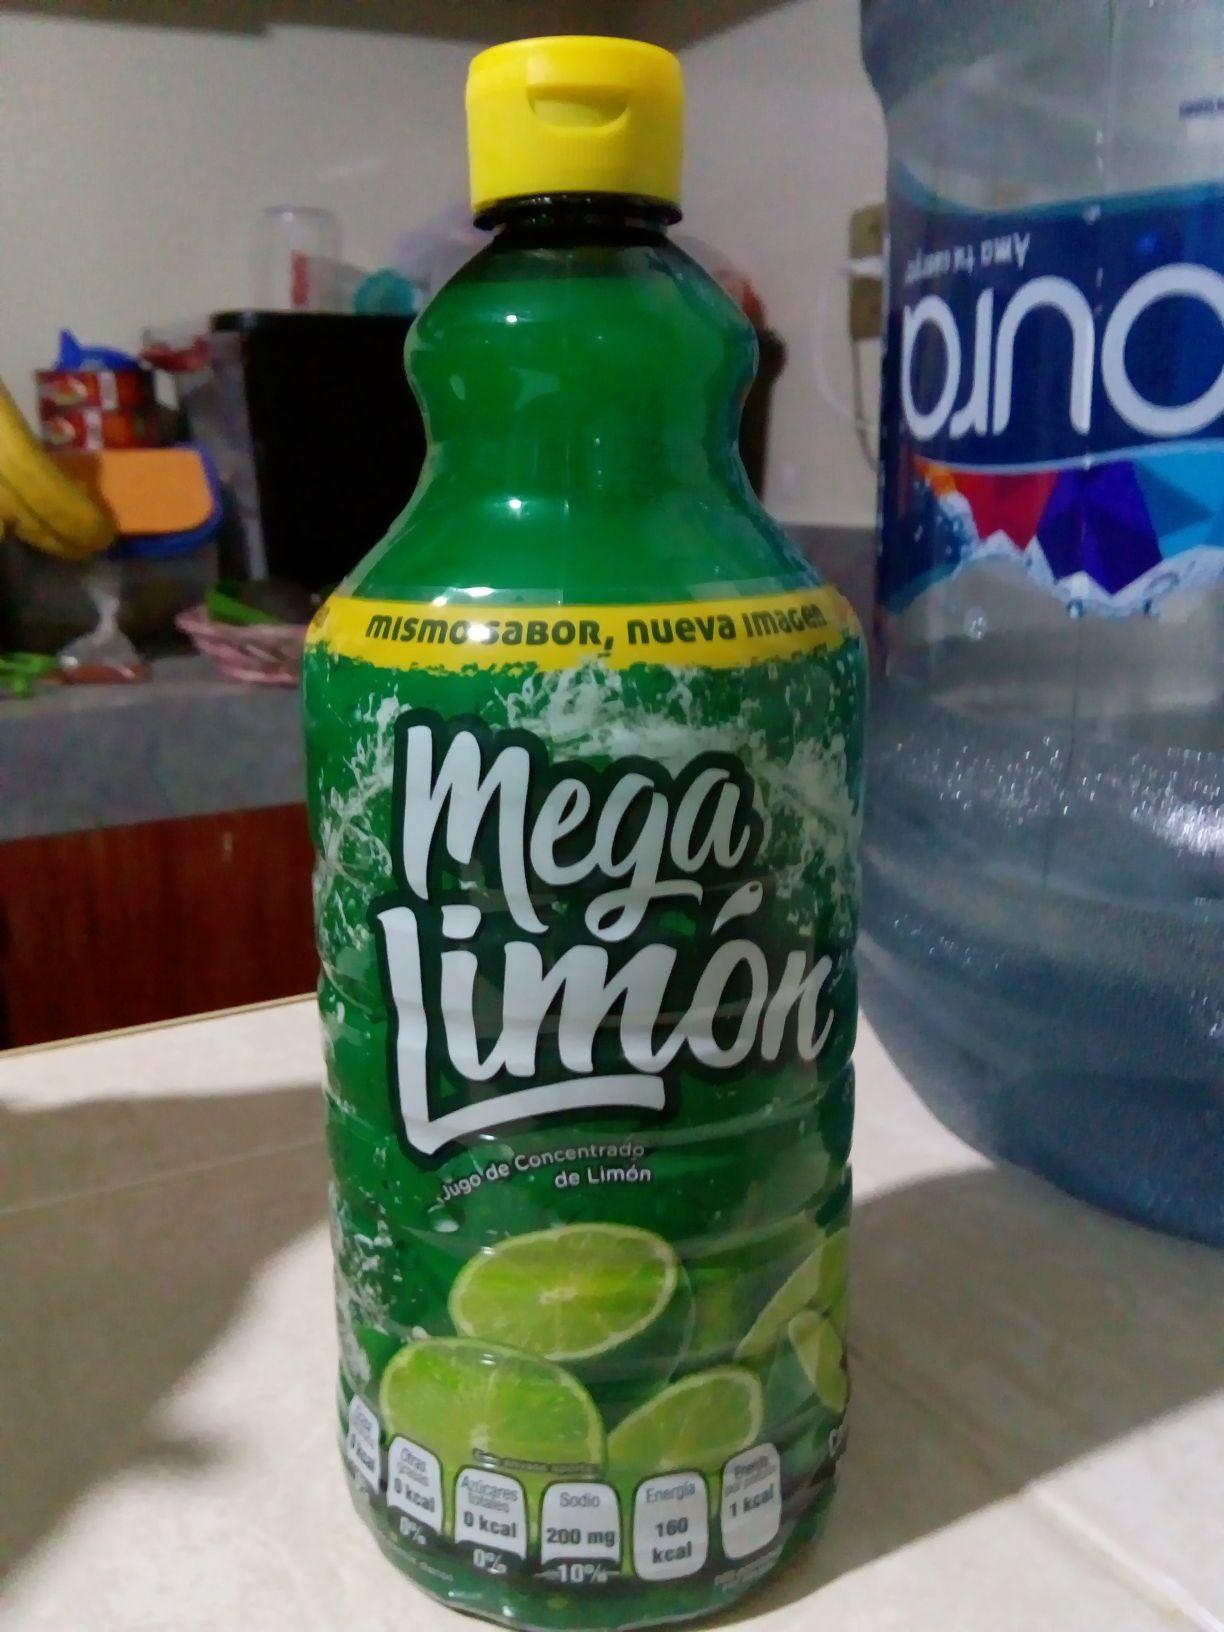 Bodega Aurrera: Mega Limón, jugo concentrado